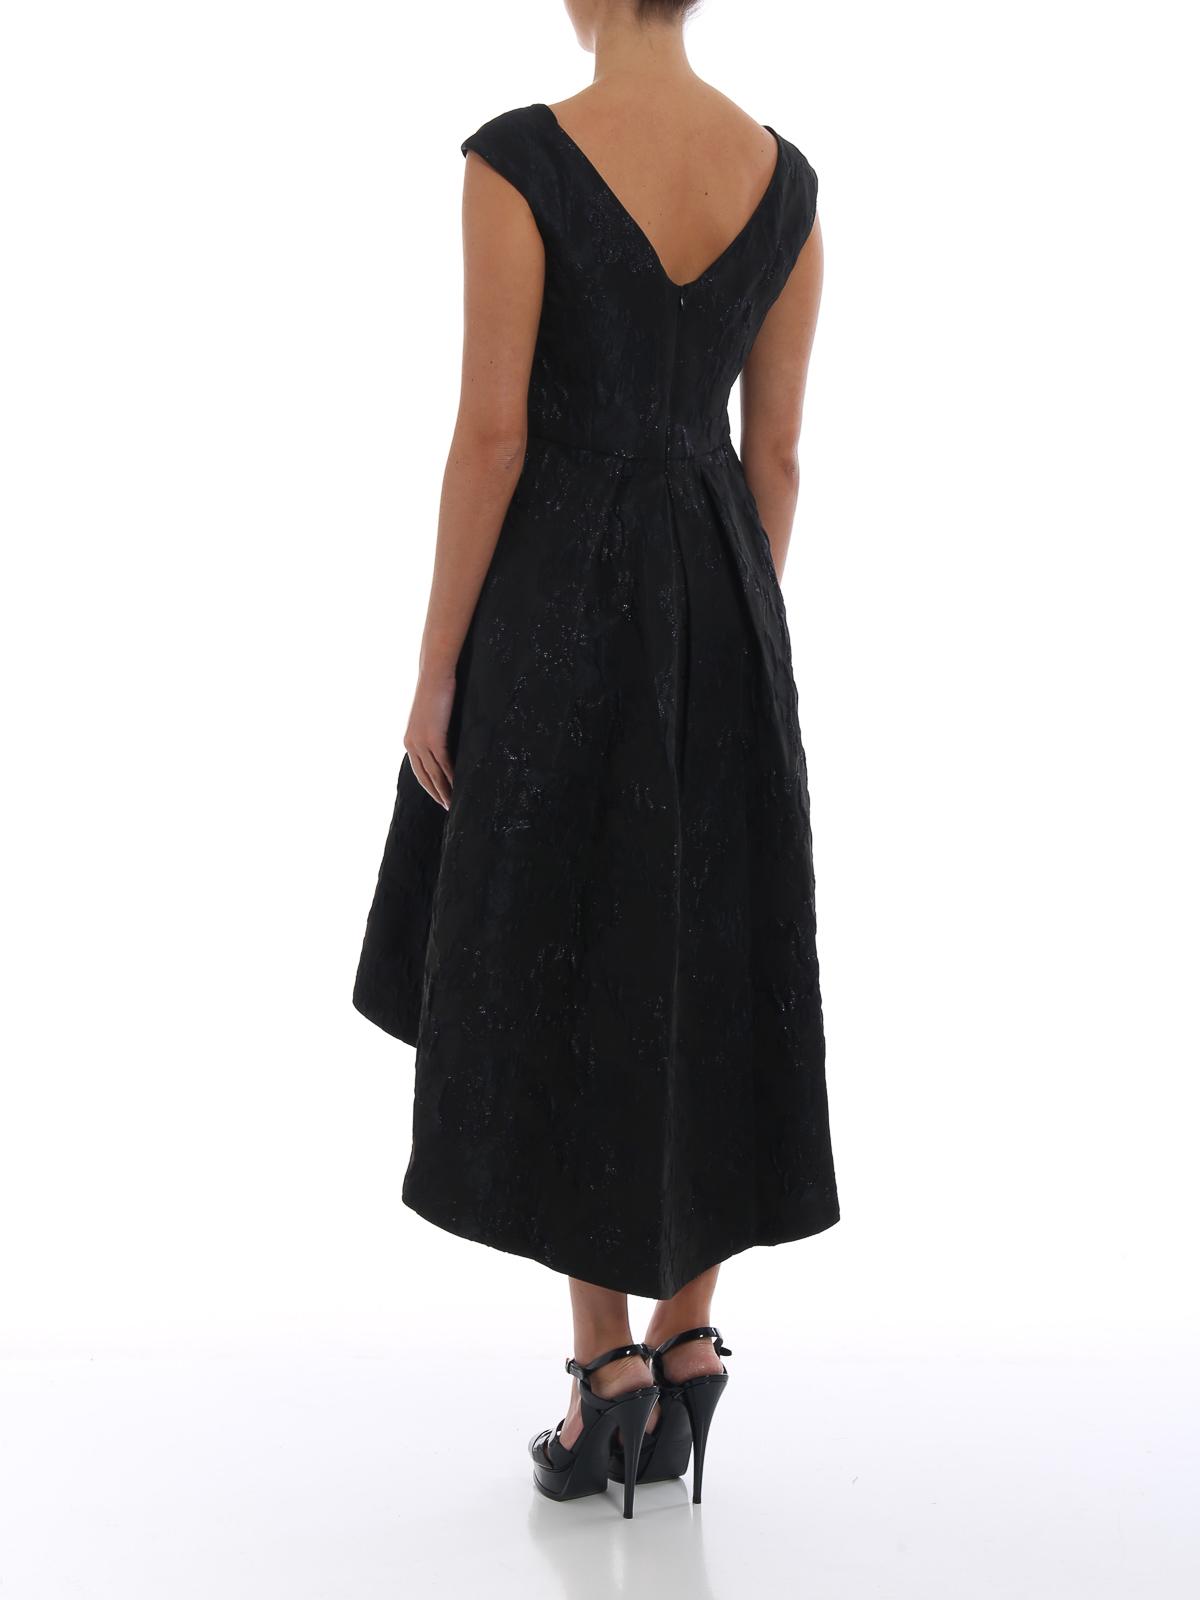 Ralph Lauren - Embossed metallic jacquard asymmetric dress